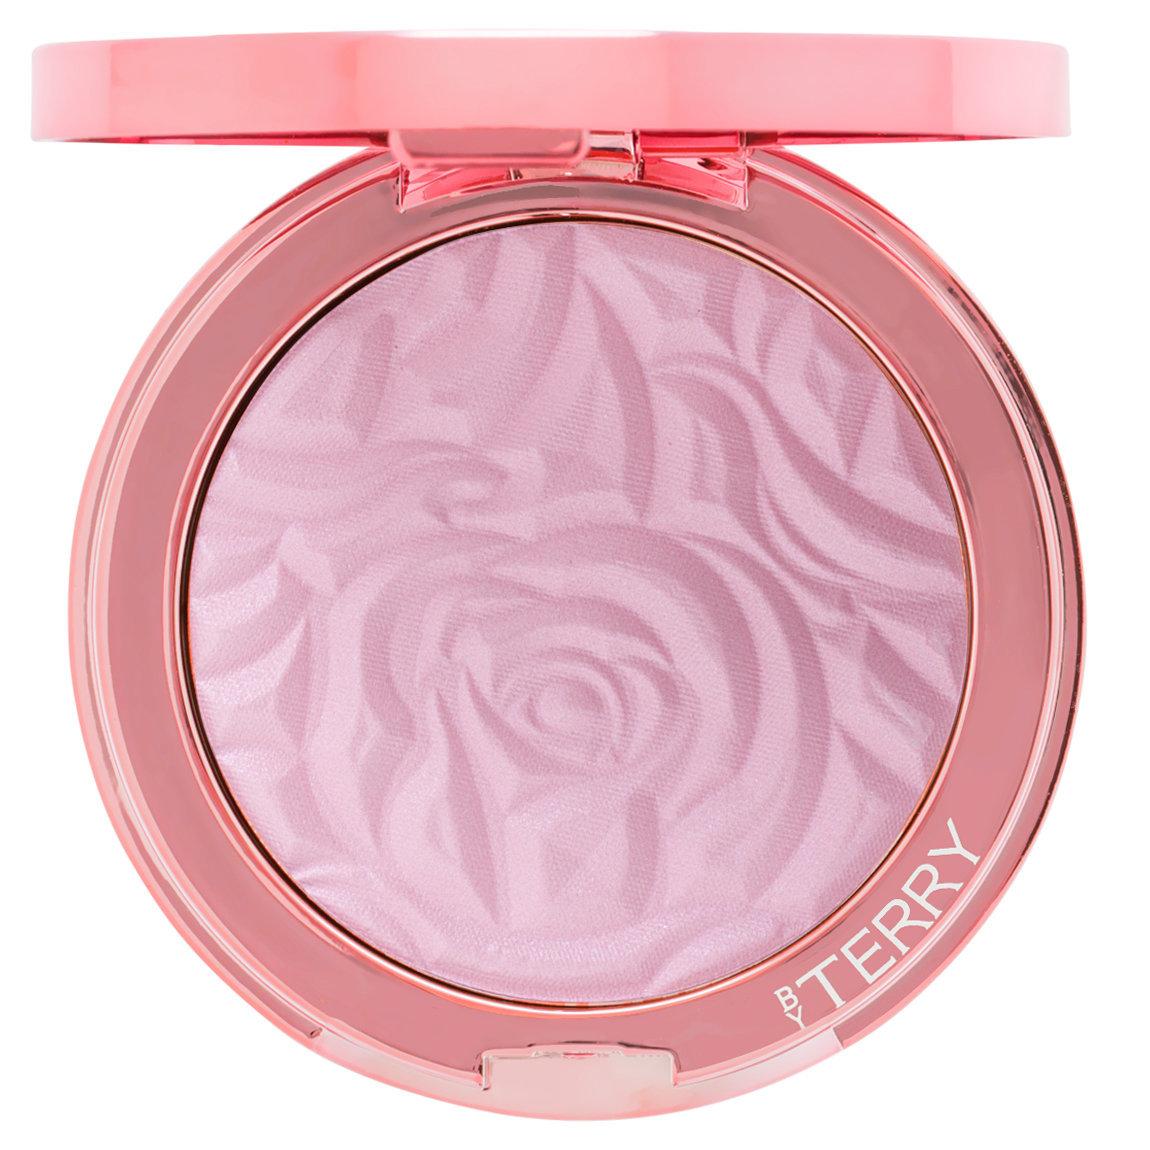 BY TERRY Brightening CC Serum Powder Rose Elixir product swatch.